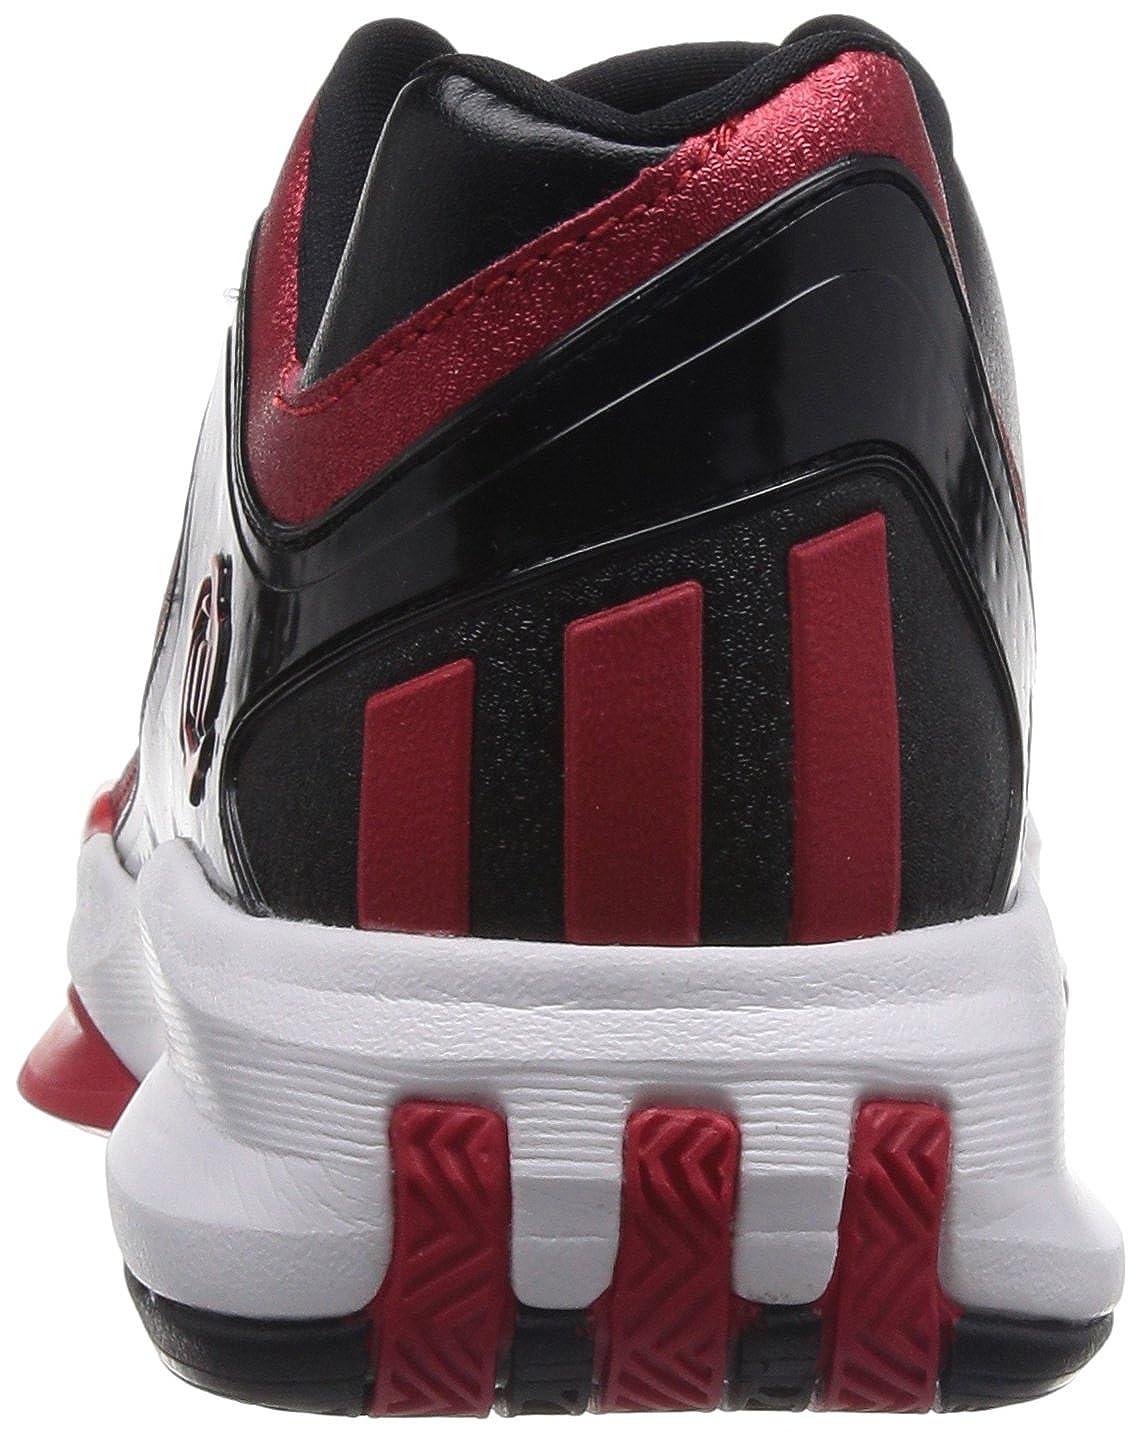 Adidas D Rosa Englewood III Herren Basketball Turnschuhe